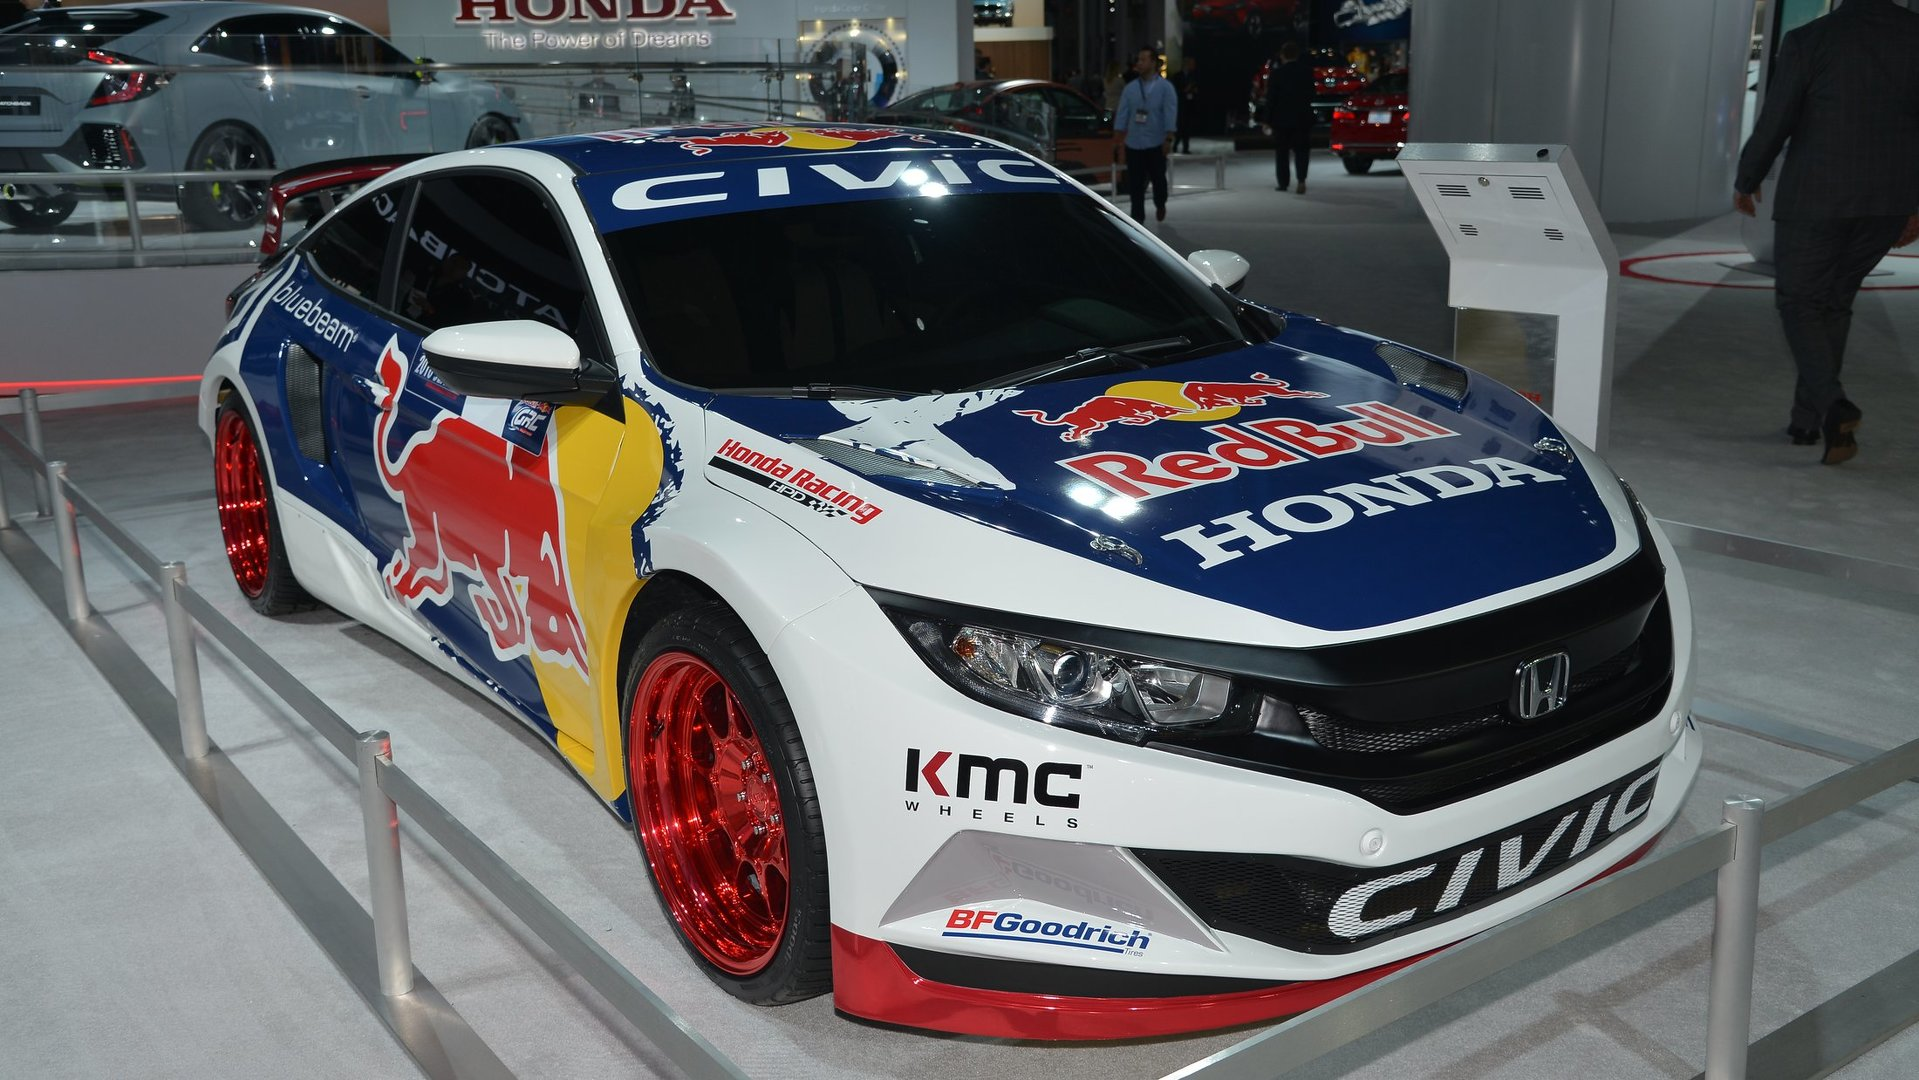 2016 honda civic coupe red bull global rallycross race car debuts in - 2016 Honda Civic Coupe Red Bull Global Rallycross Race Car Debuts In 30